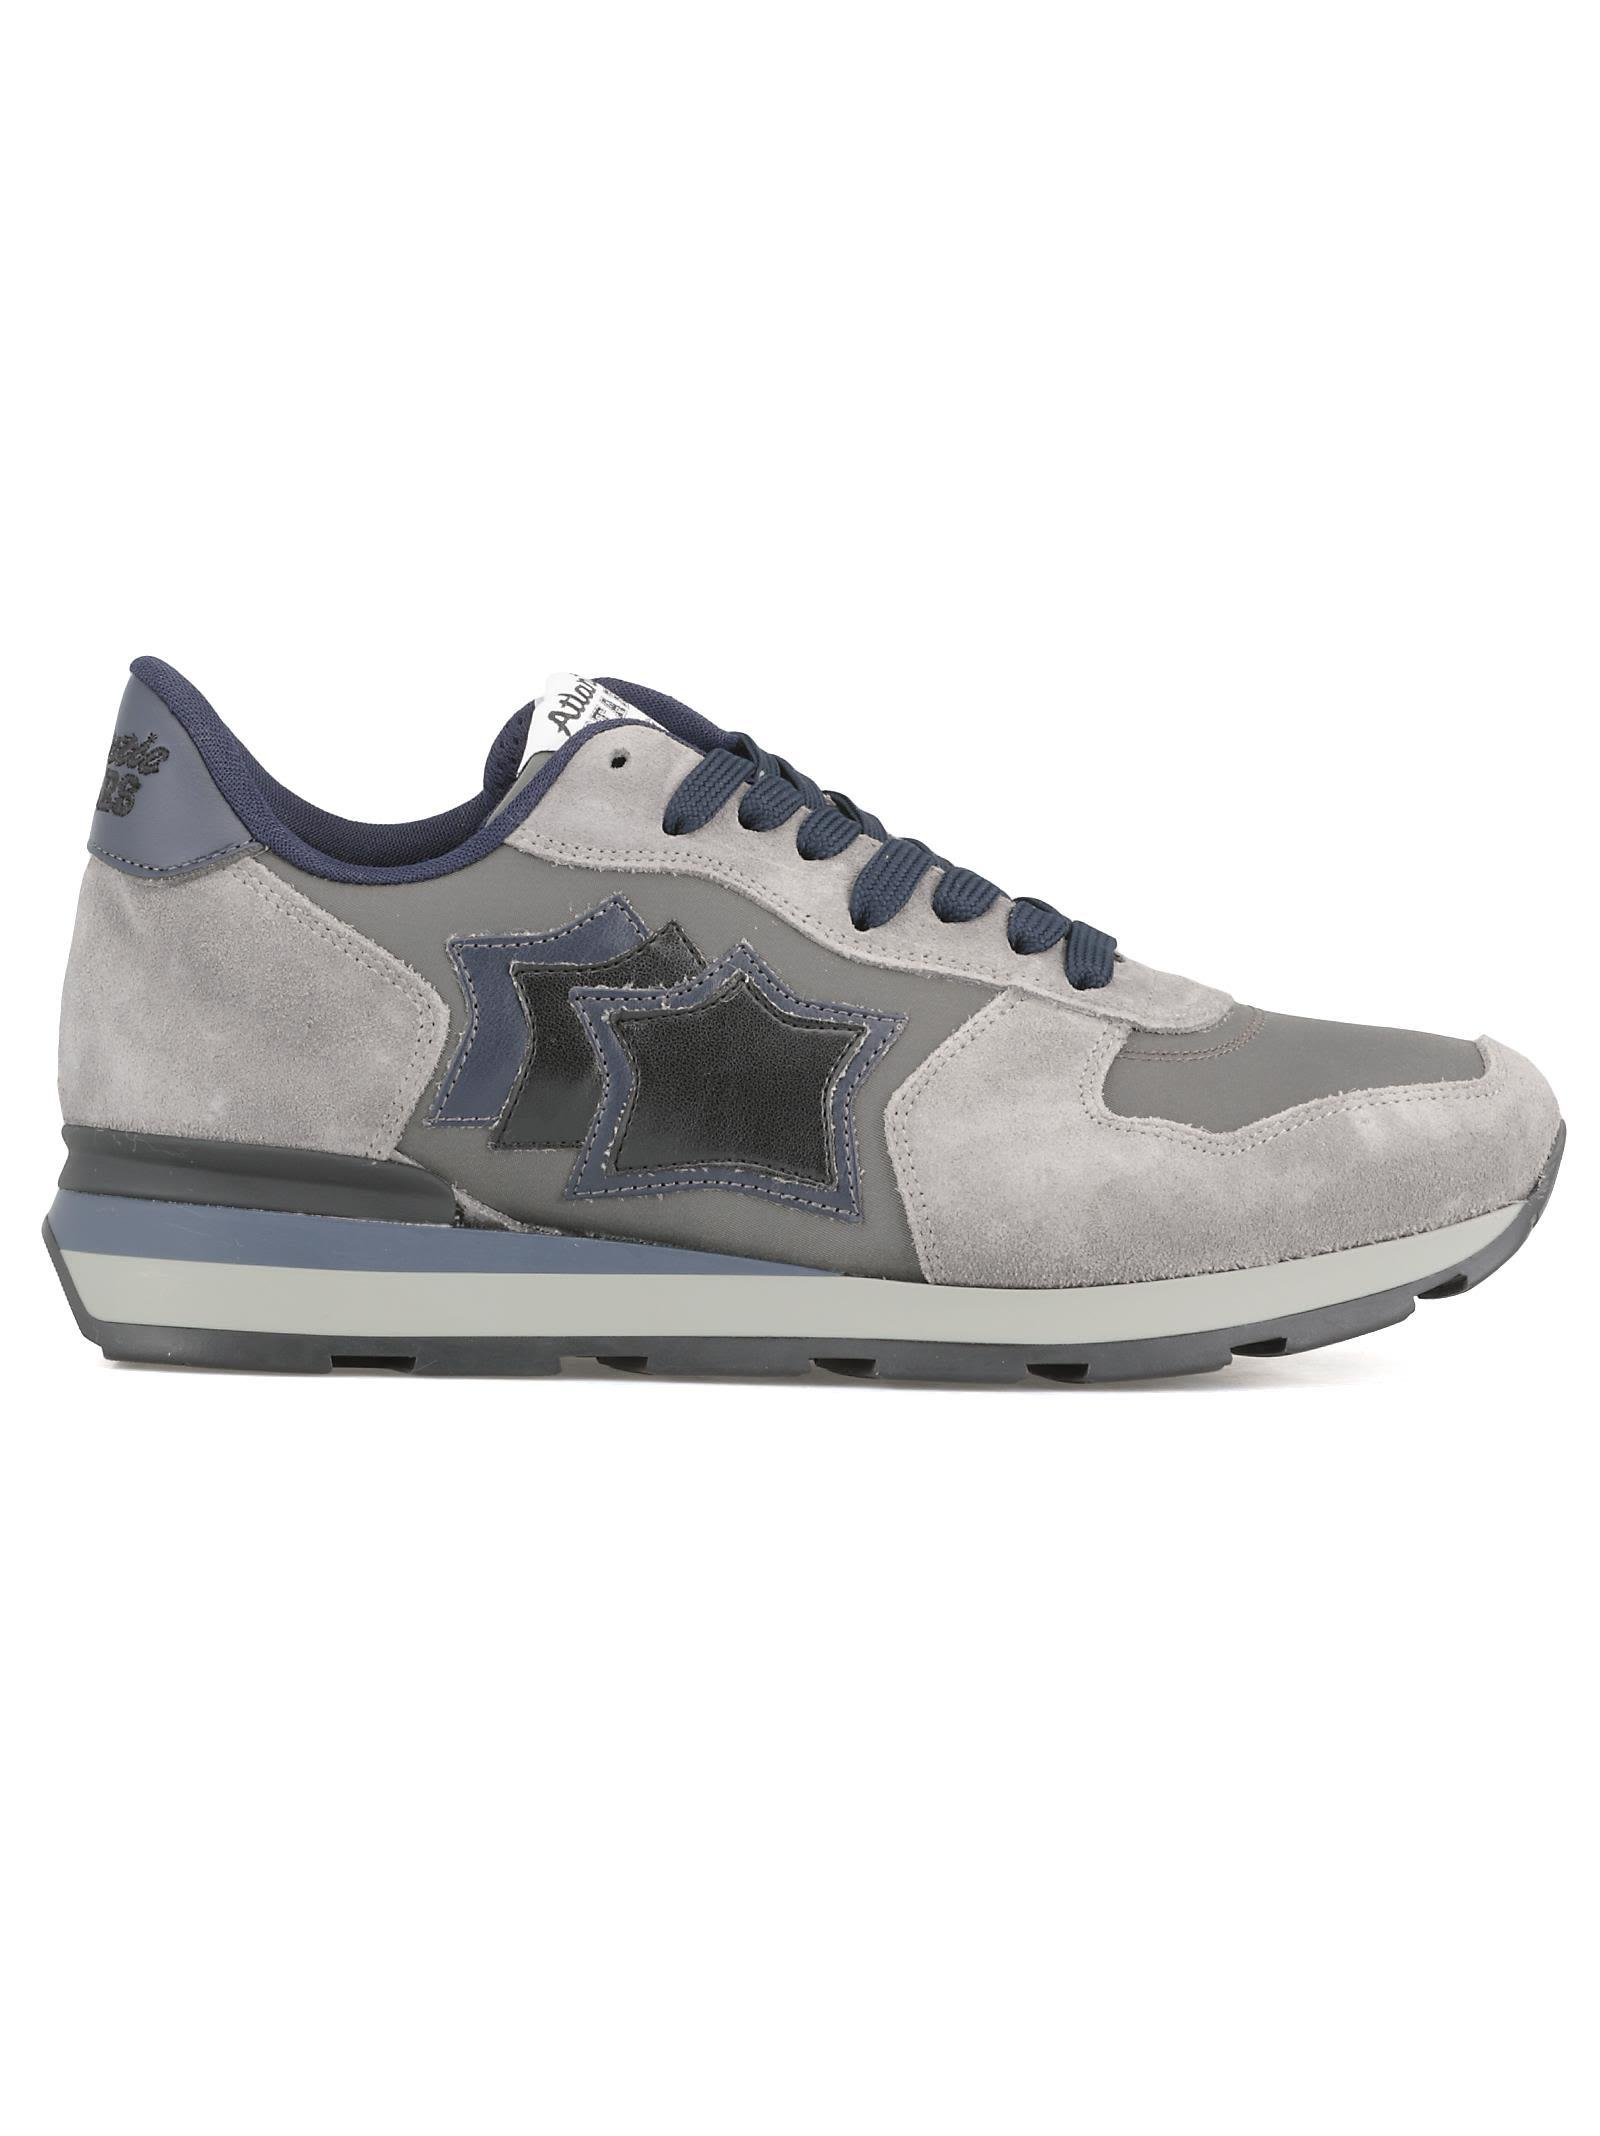 Atlantic Stars Antares Sneaker In Grey